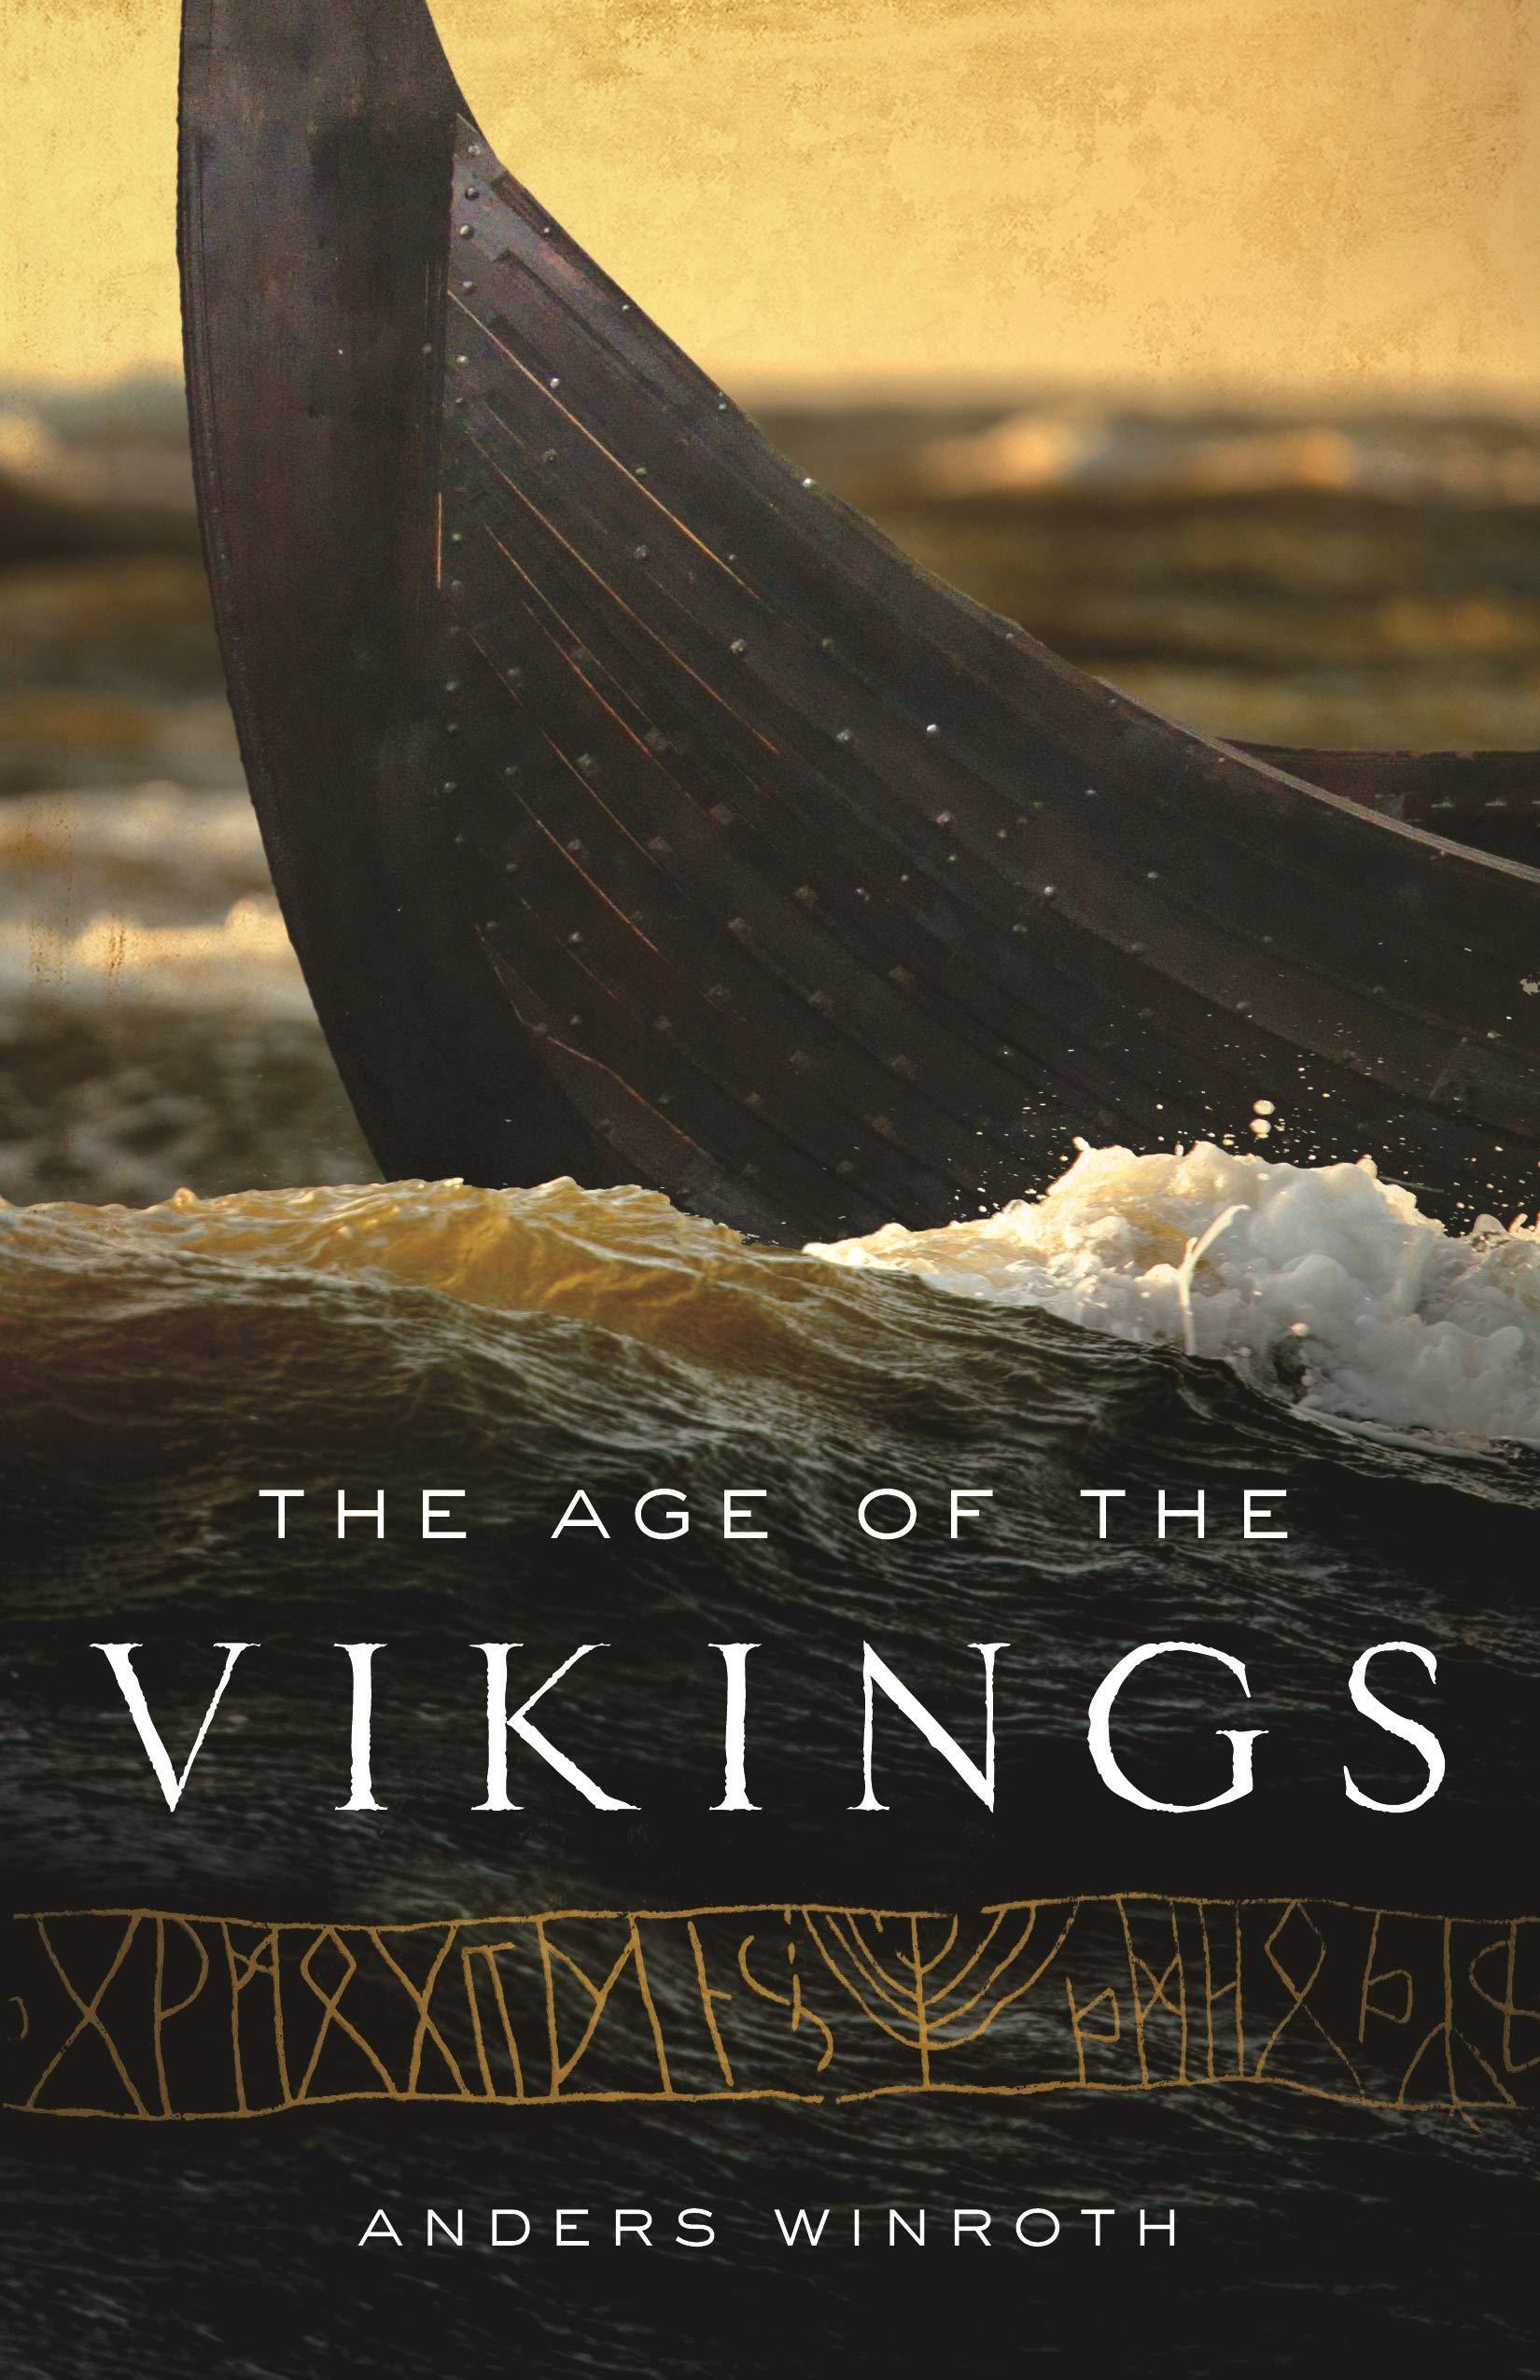 The Age of the Vikings: Amazon.es: Winroth, Anders: Libros en idiomas extranjeros